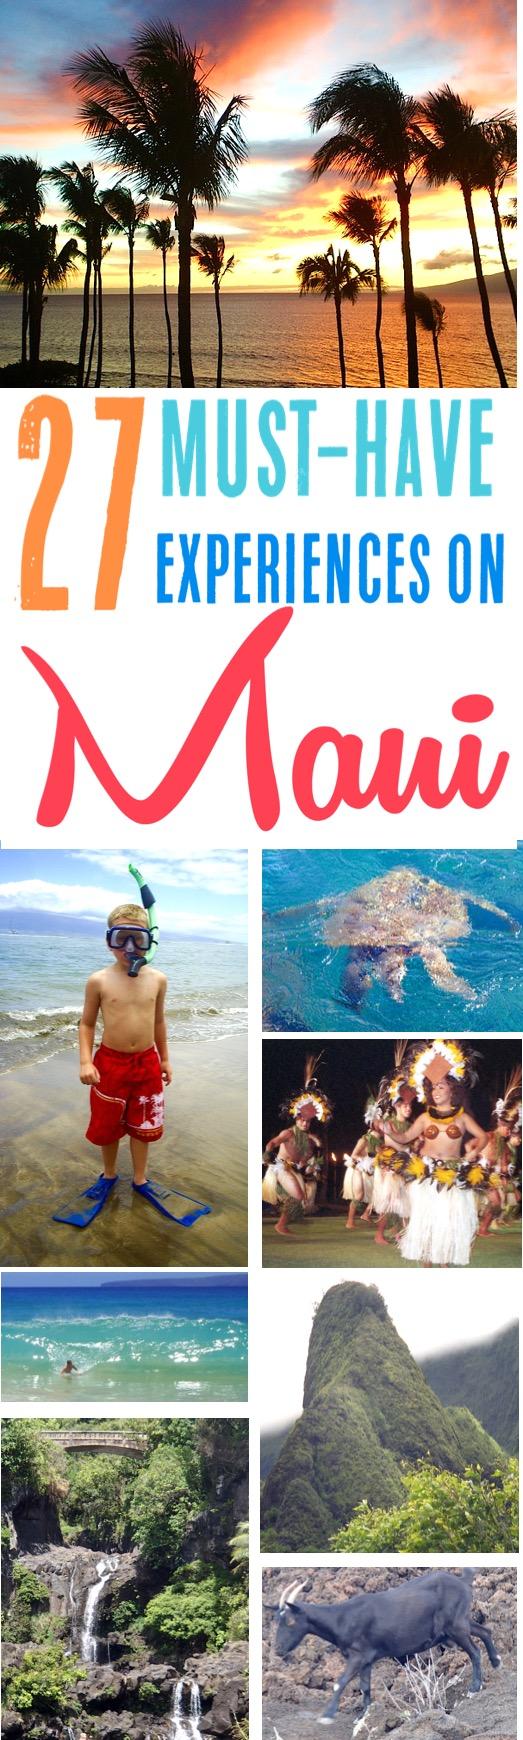 Maui Hawaii Vacation Things to Do in Maui